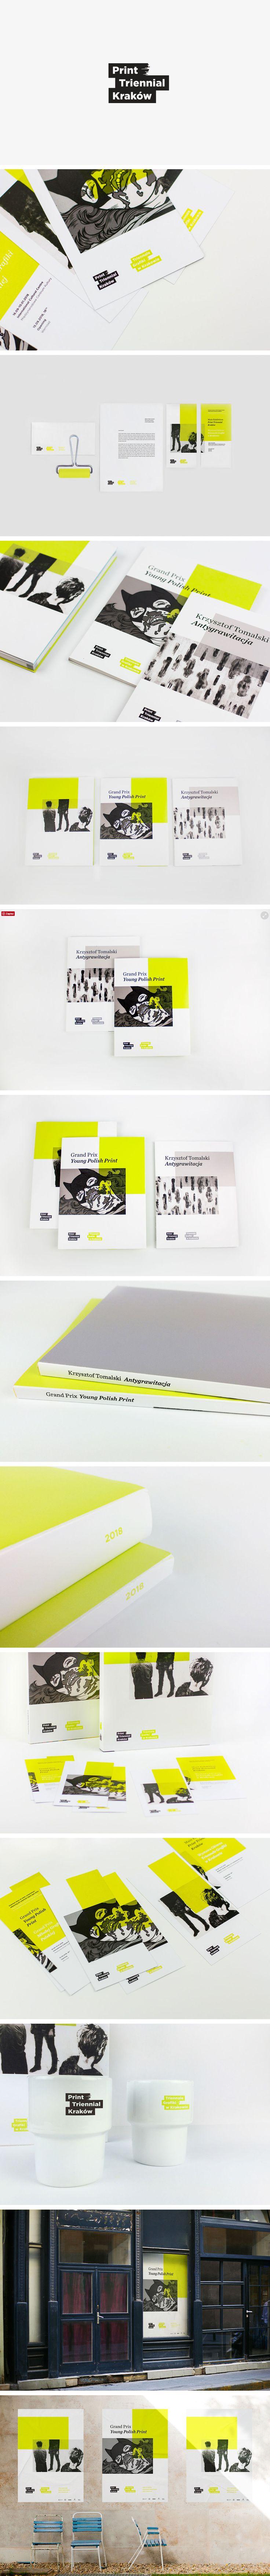 PRINT TRIENNIAL KRAKÓW  https://www.behance.net/gallery/43168989/Print-Triennial-Krakow-Visual-Identity  FUZZ STUDIO on Behance